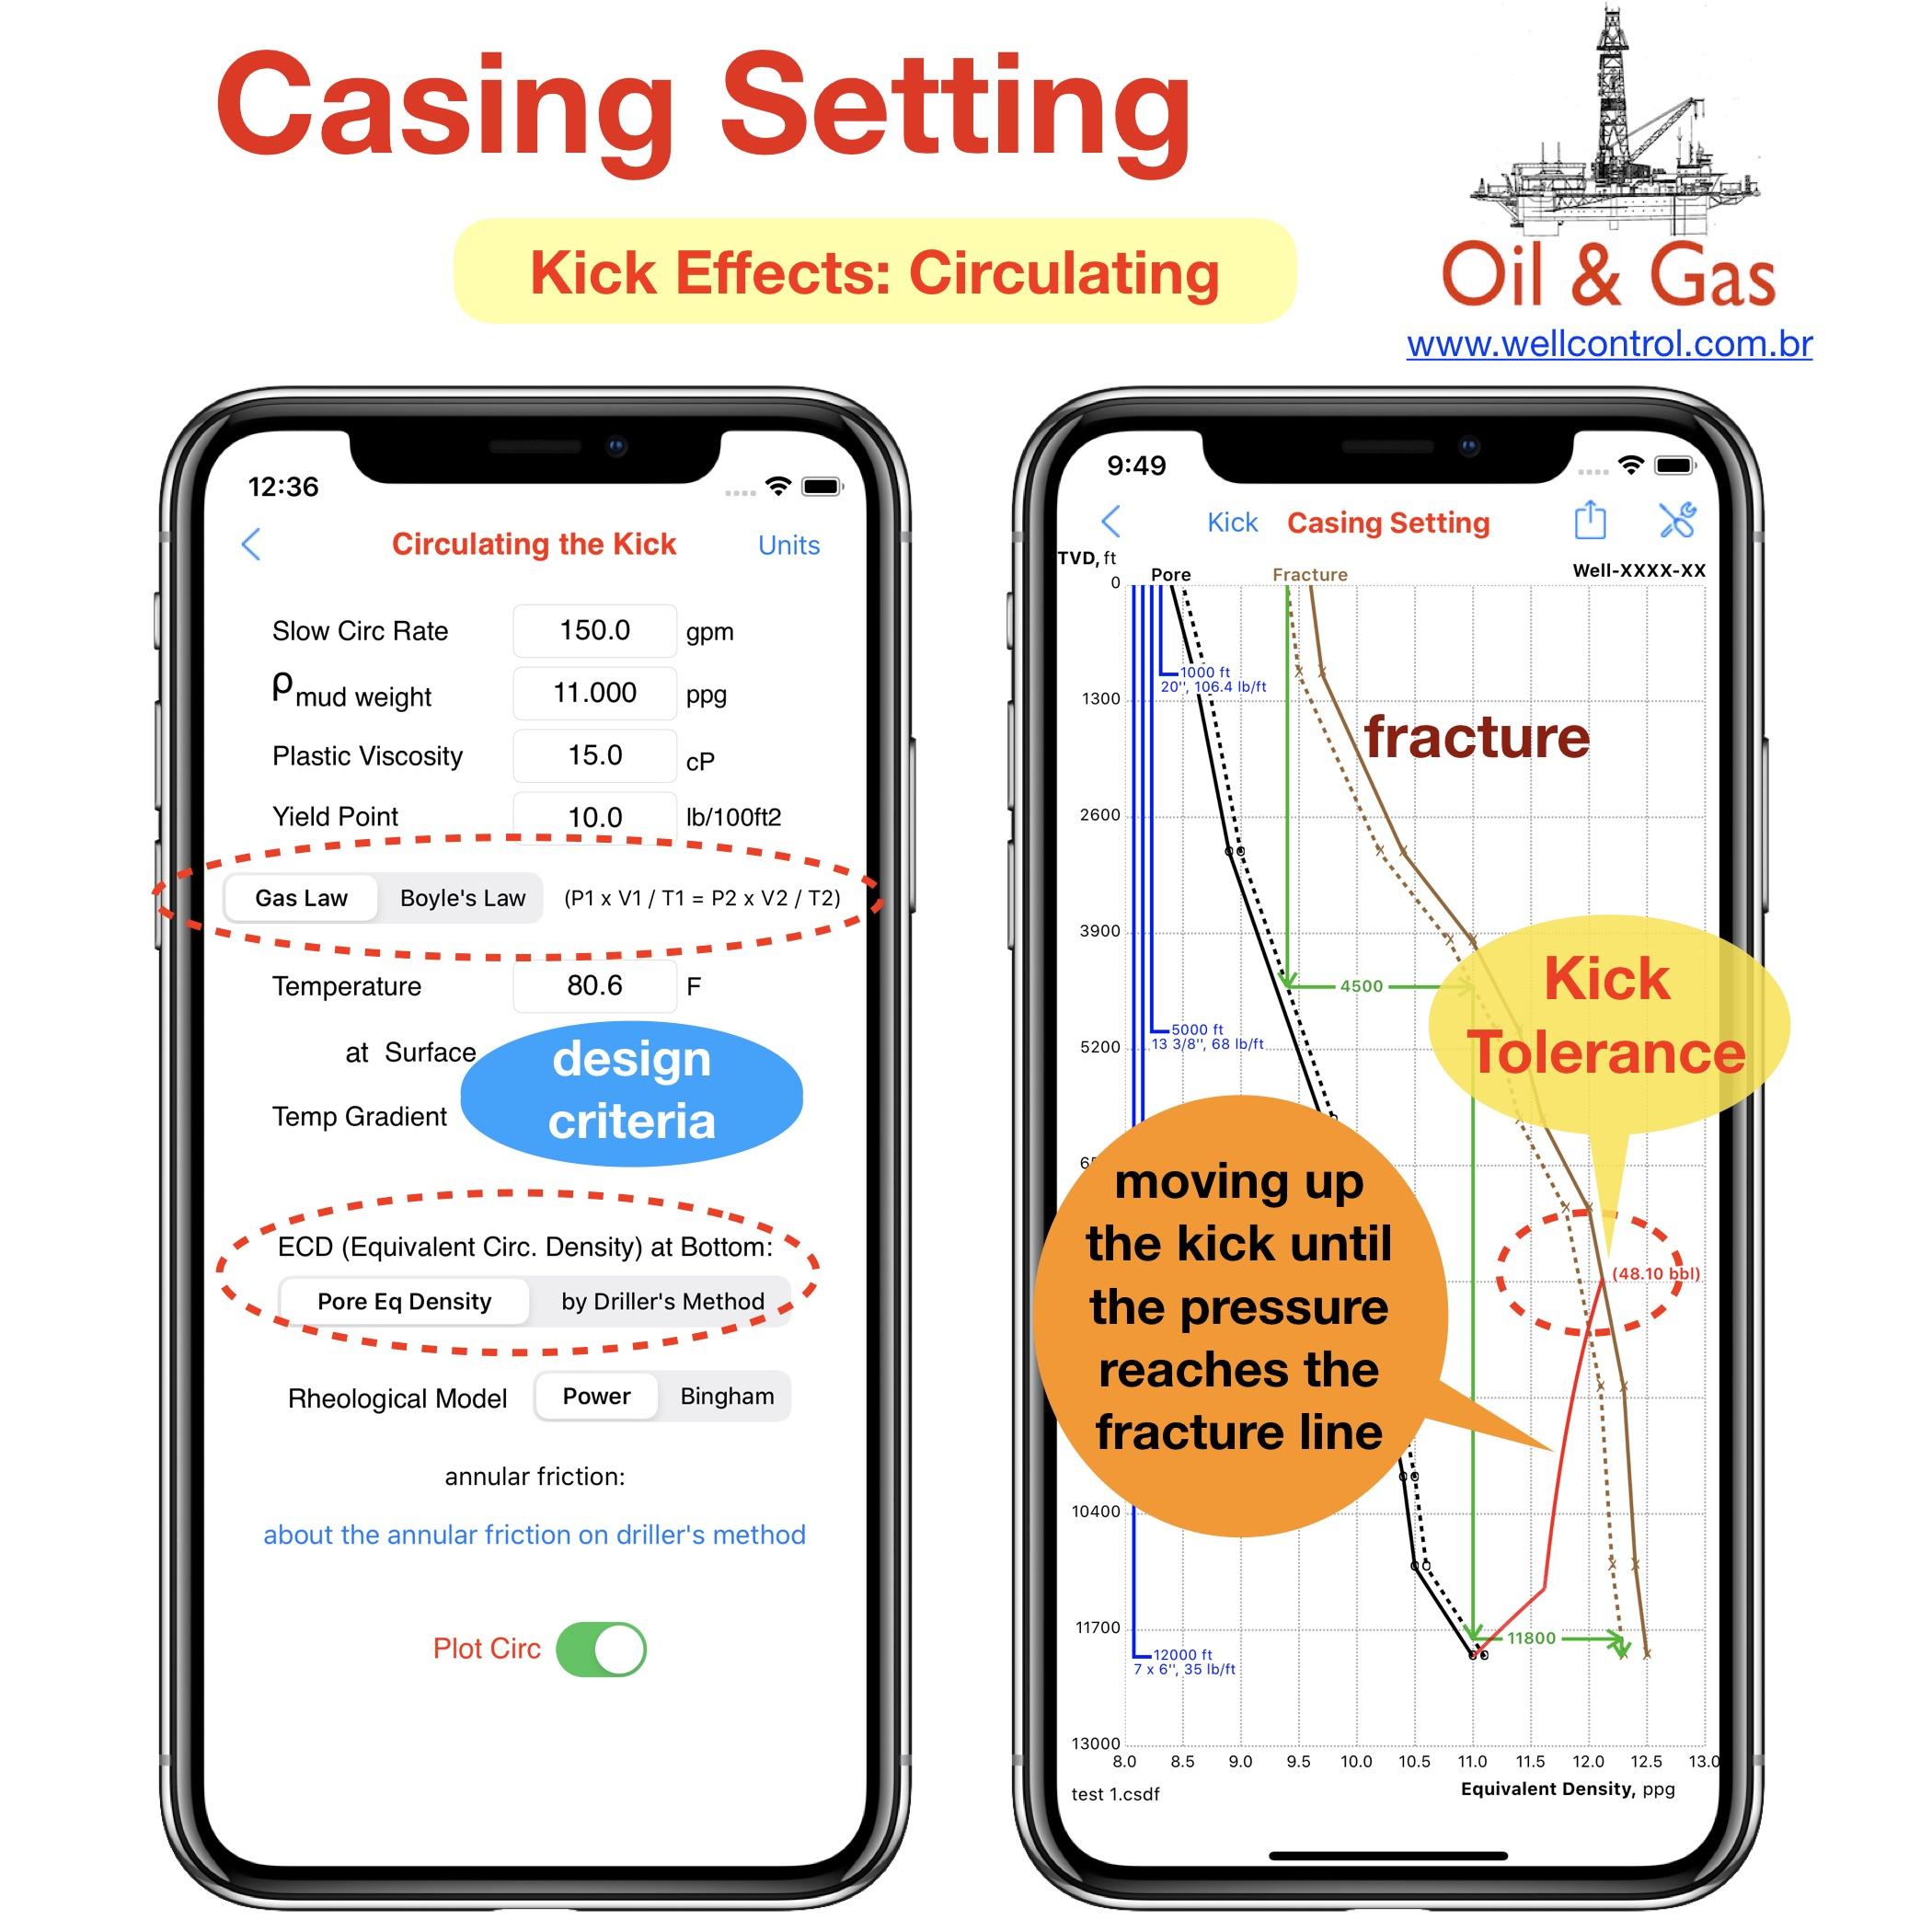 casing_setting_05